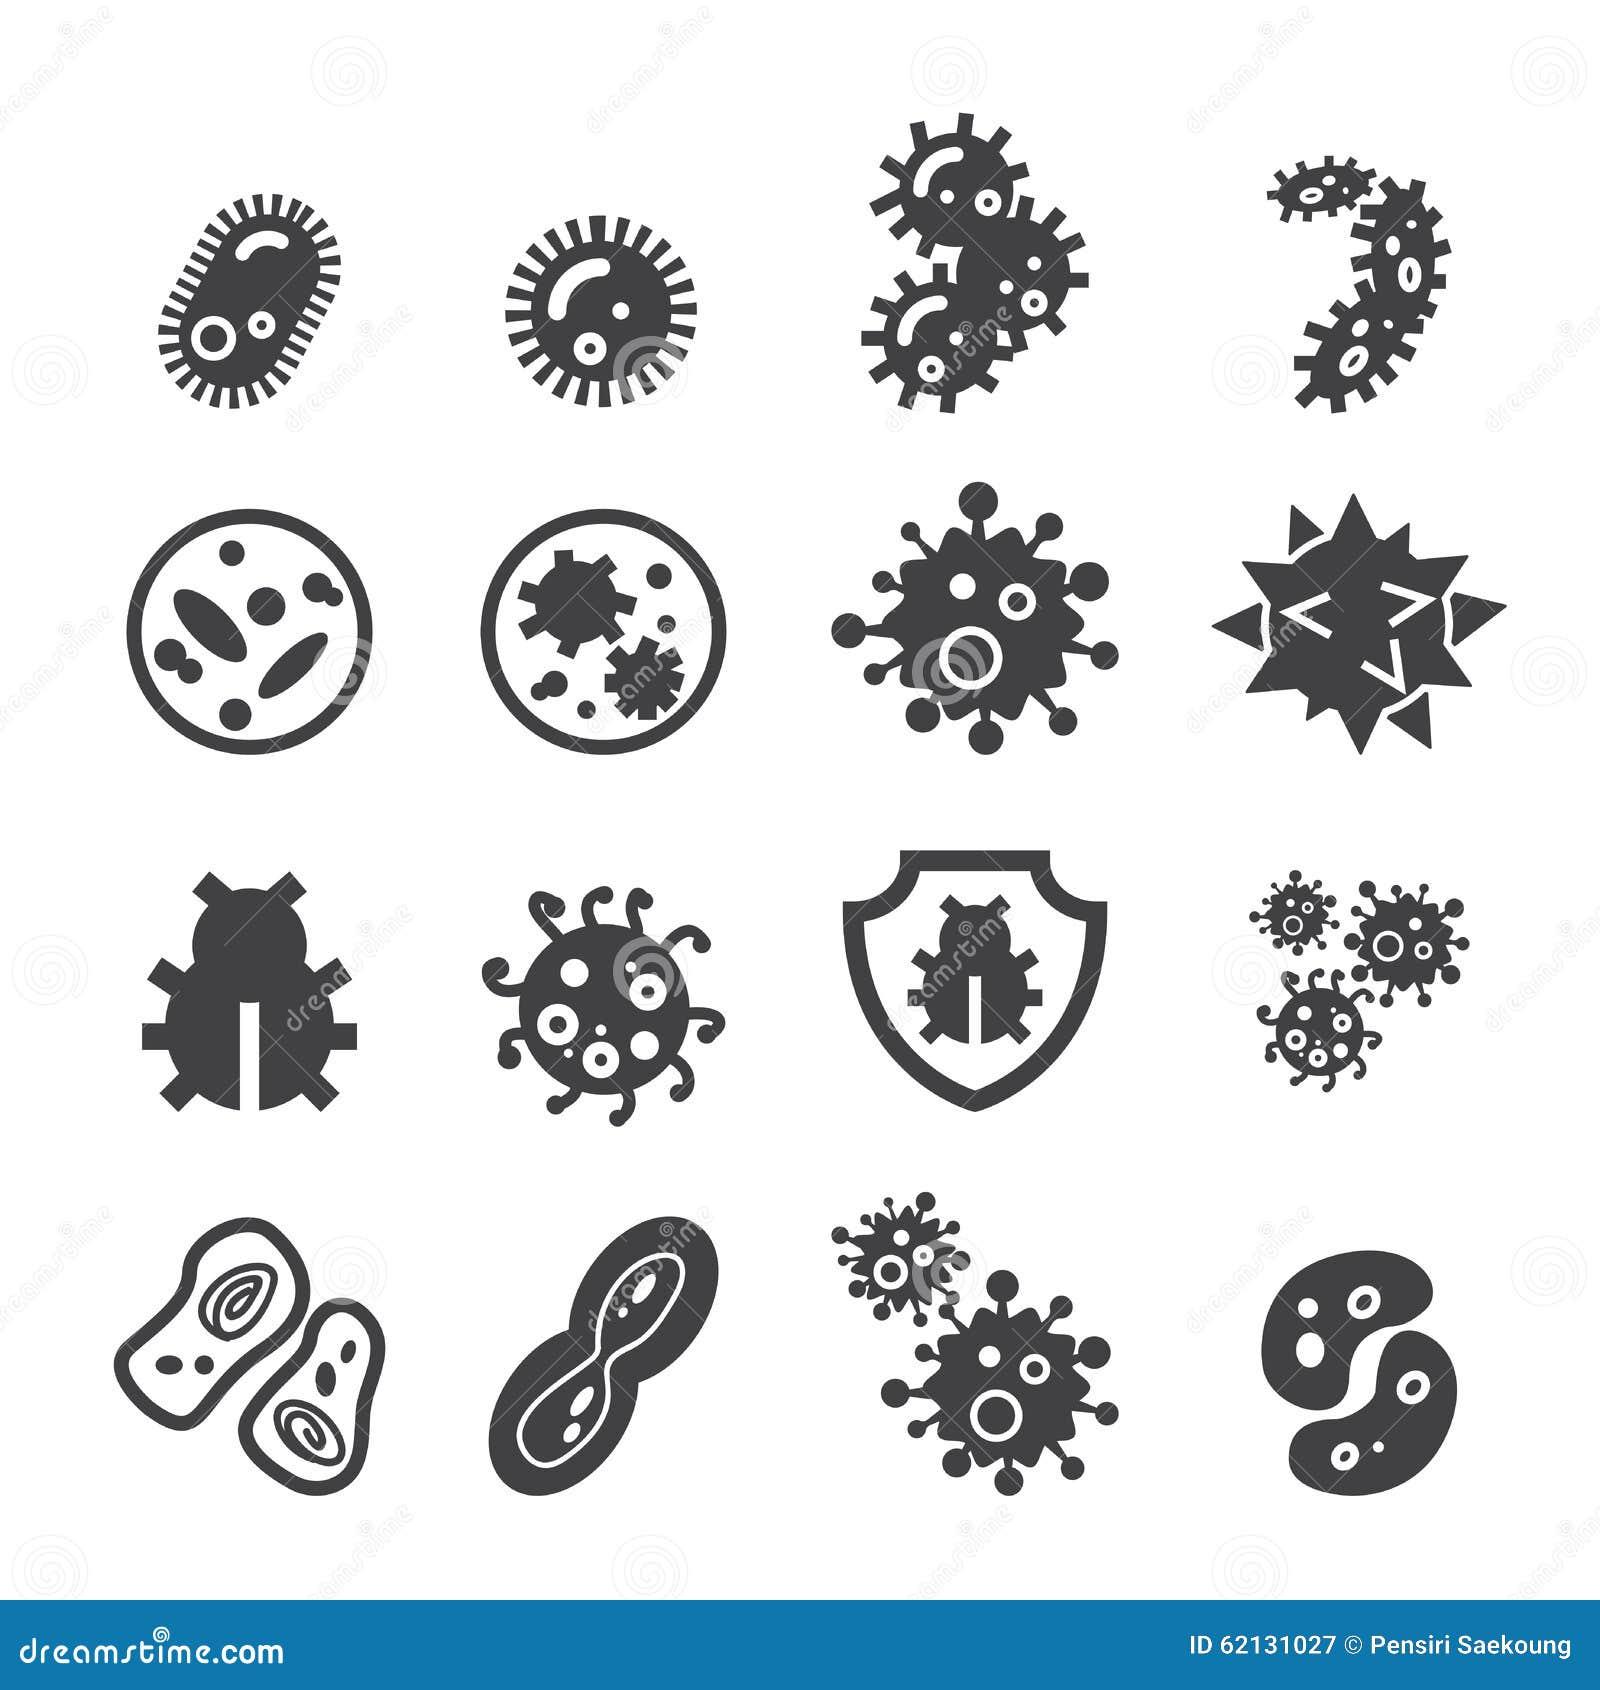 Vector Illustration Web Designs: Bacteria Icon Stock Vector. Image Of Petri, Pictogram